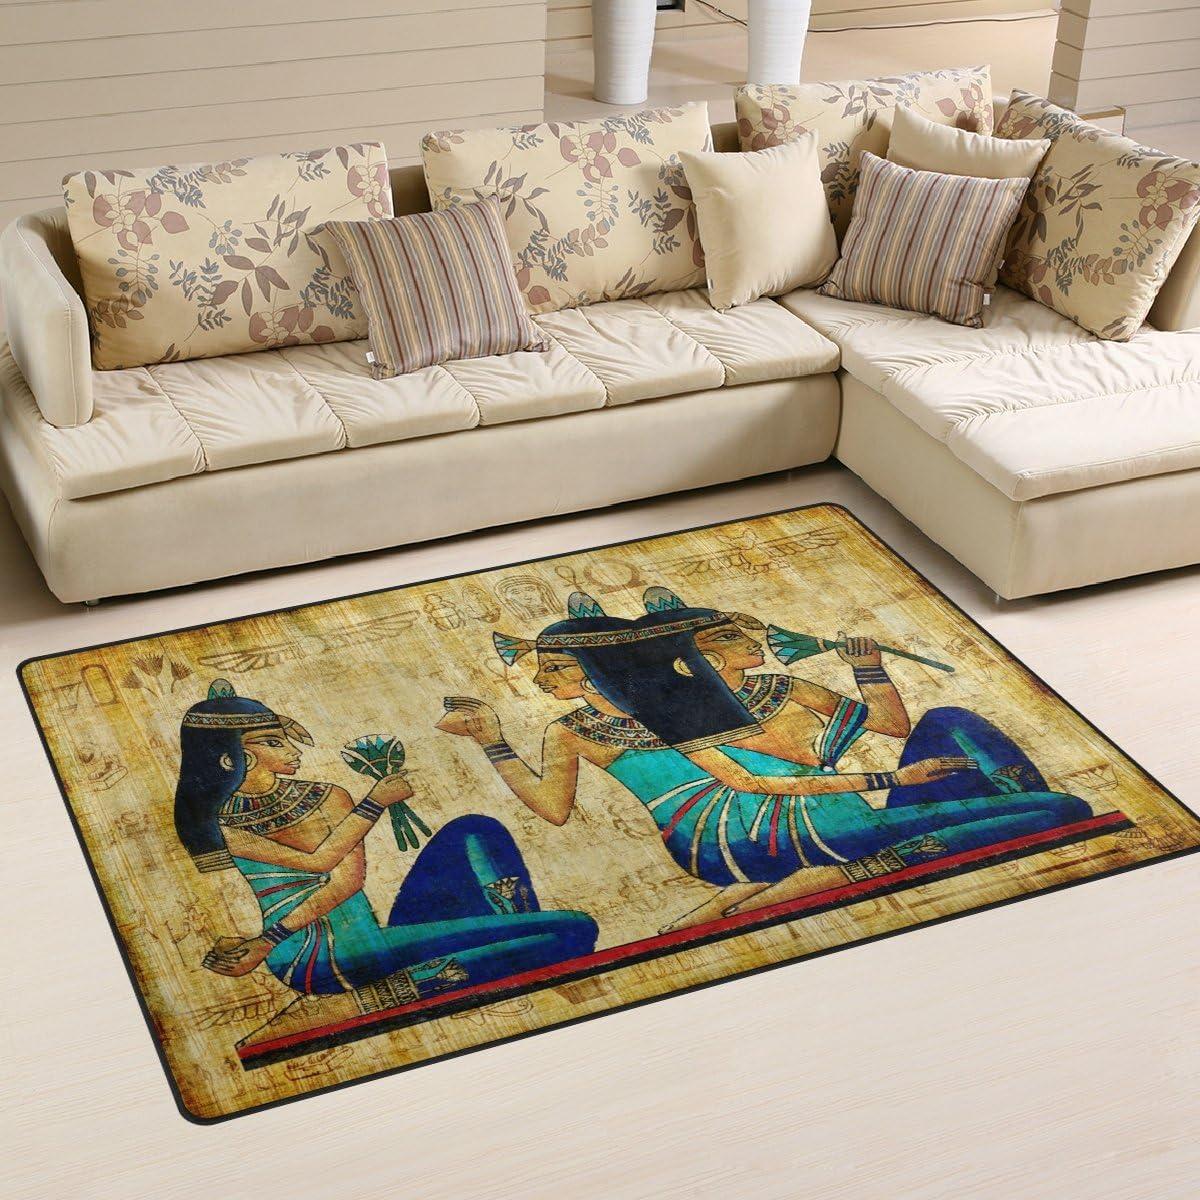 Yochoice Non-slip Area Rugs Home Decor, Ancienl Egyptian Woman Floor Mat Living Room Bedroom Carpets Doormats 60 x 39 inches